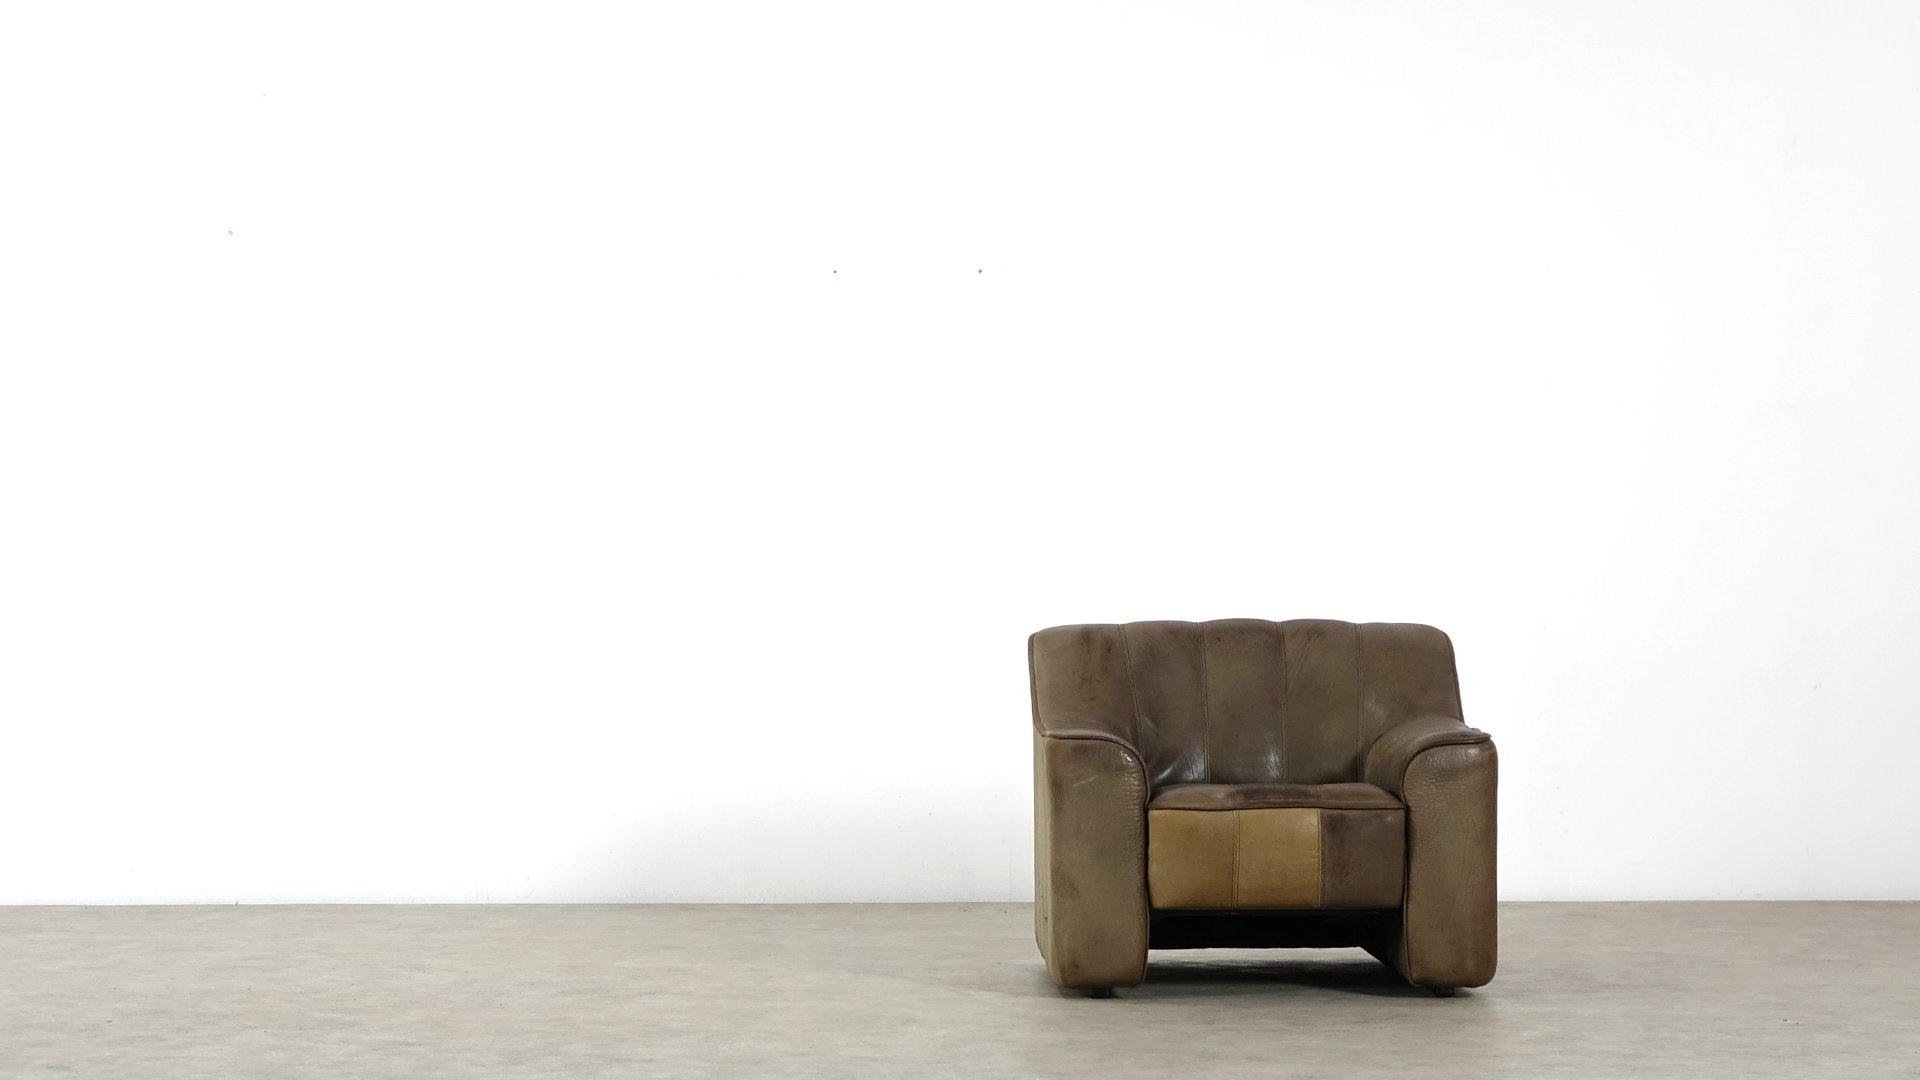 ausziehbarer ds 44 leder sessel von de sede 1970er bei pamono kaufen. Black Bedroom Furniture Sets. Home Design Ideas